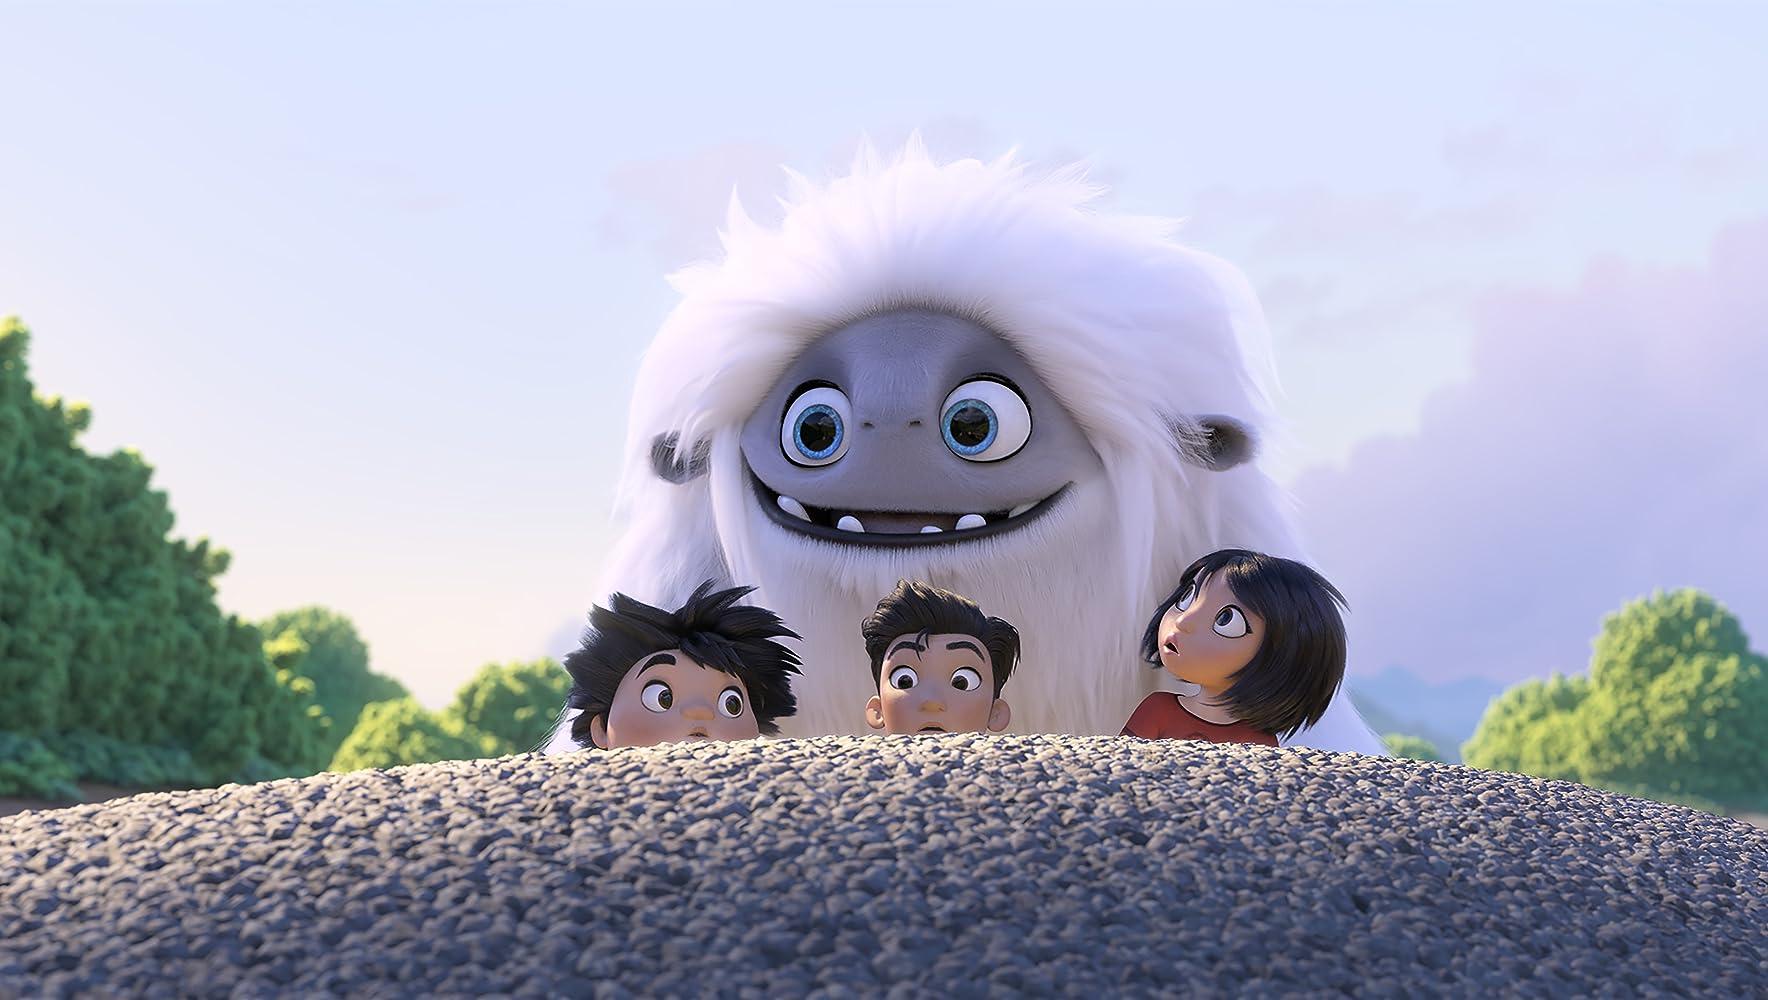 Chloe Bennet, Albert Tsai, and Tenzing Norgay Trainor in Abominable (2019)